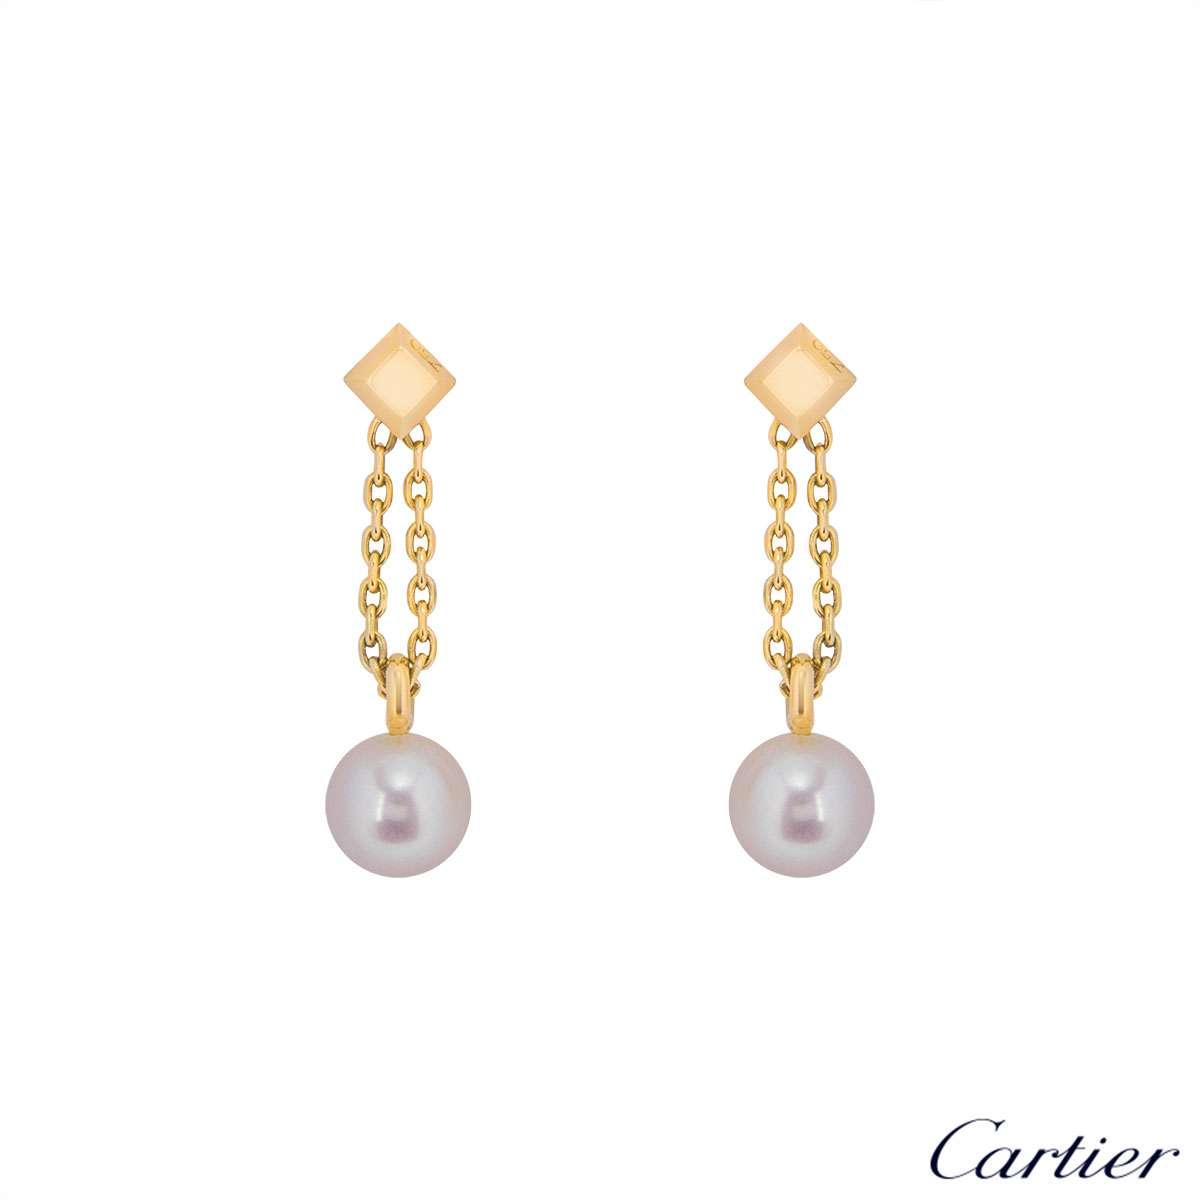 Cartier 18k Yellow Gold Pearl Drop Earrings